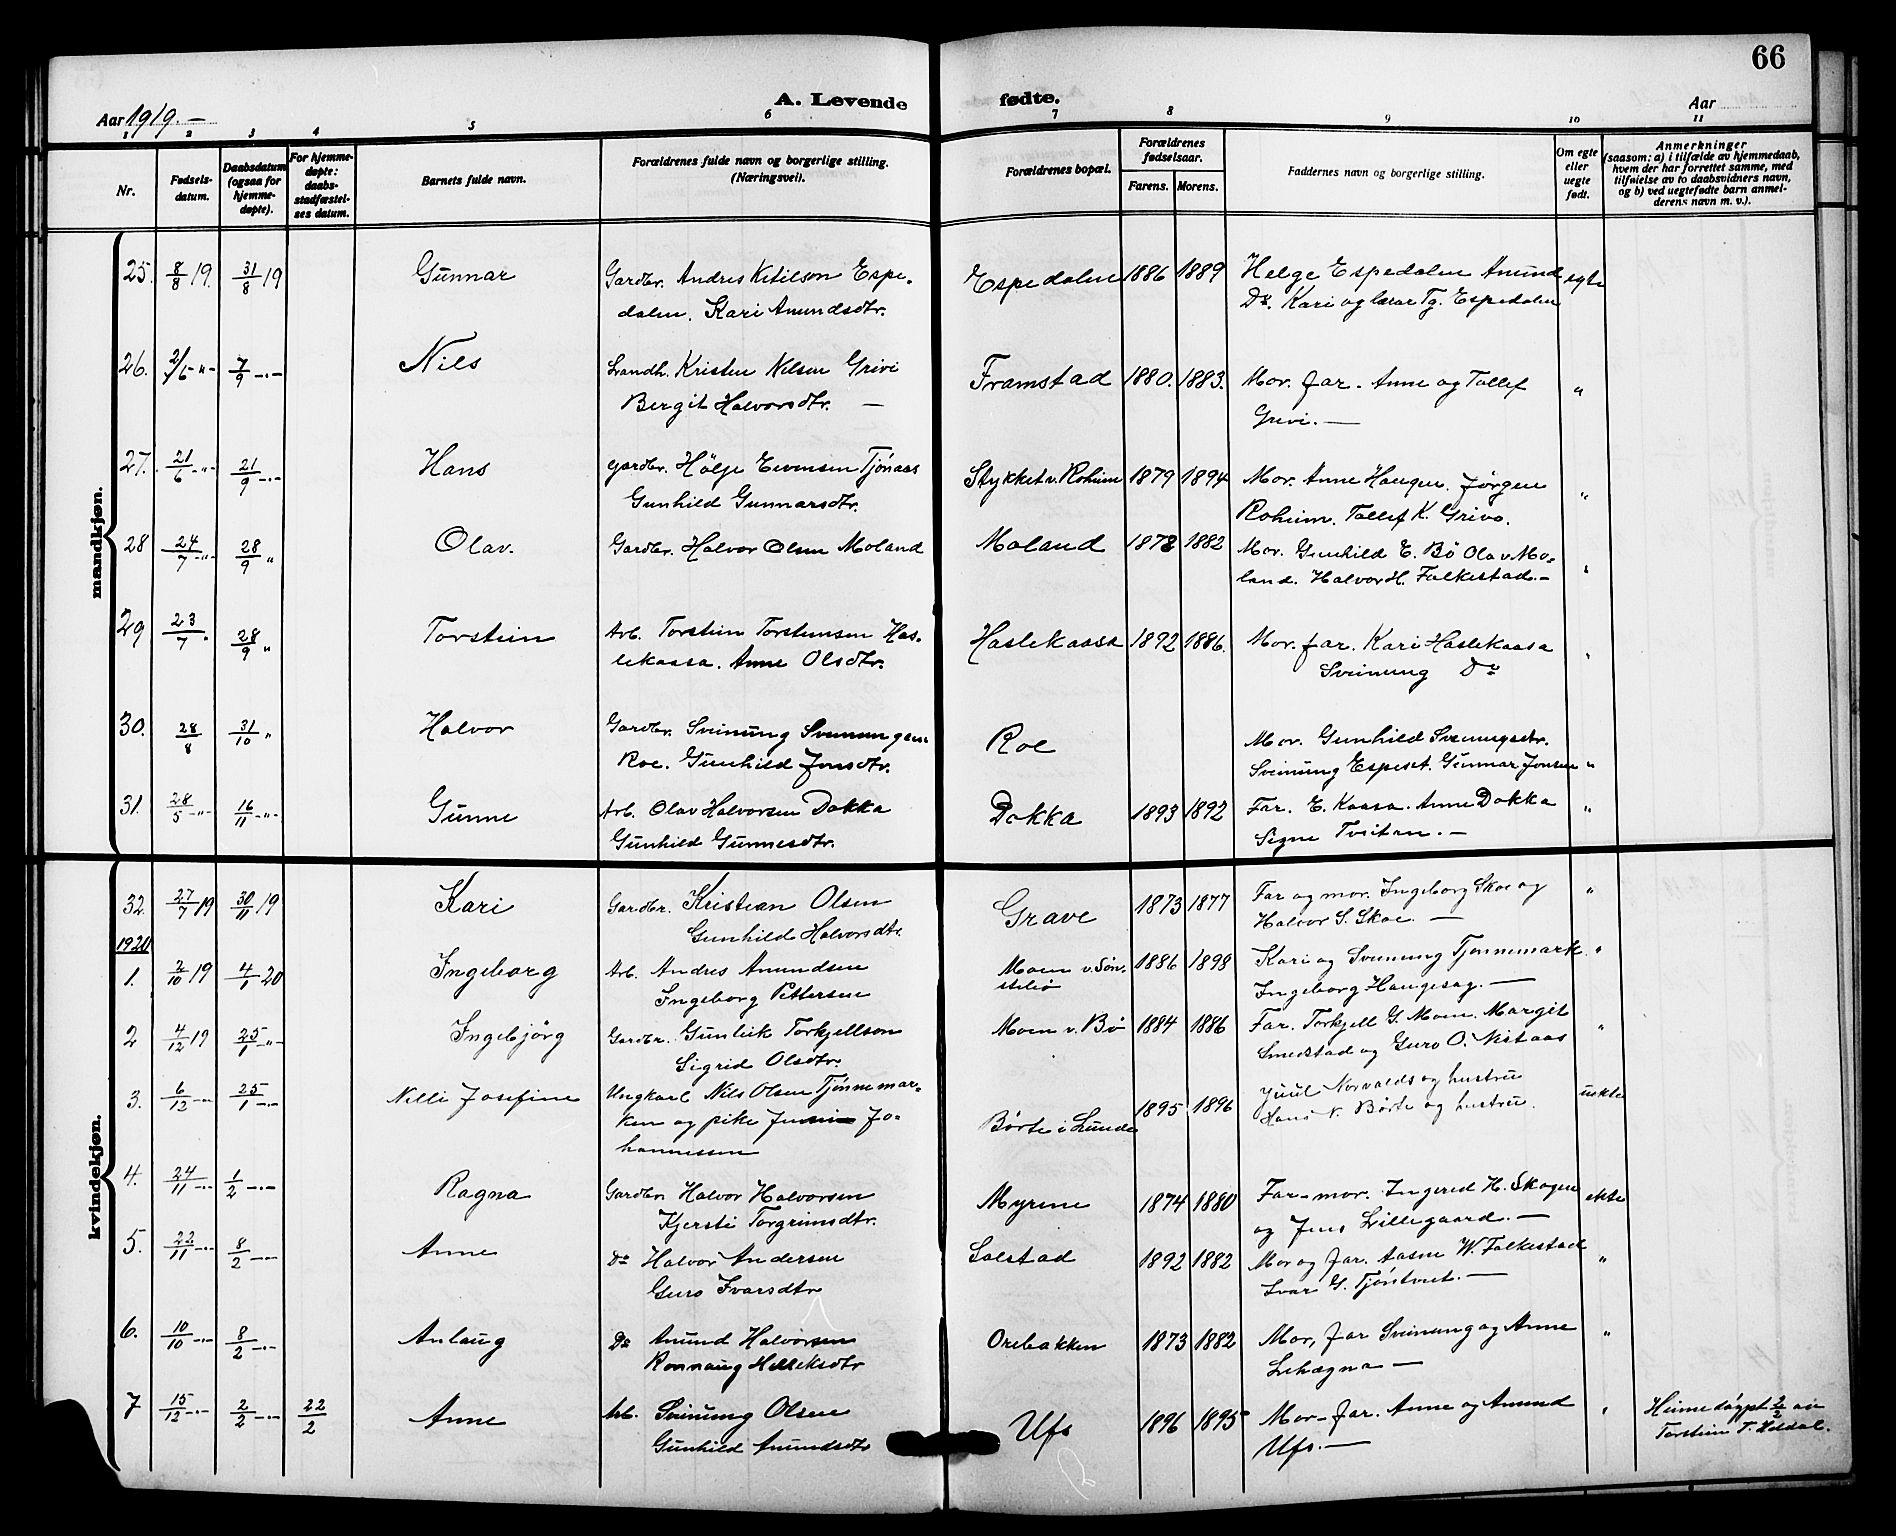 SAKO, Bø kirkebøker, G/Ga/L0007: Klokkerbok nr. 7, 1909-1924, s. 66